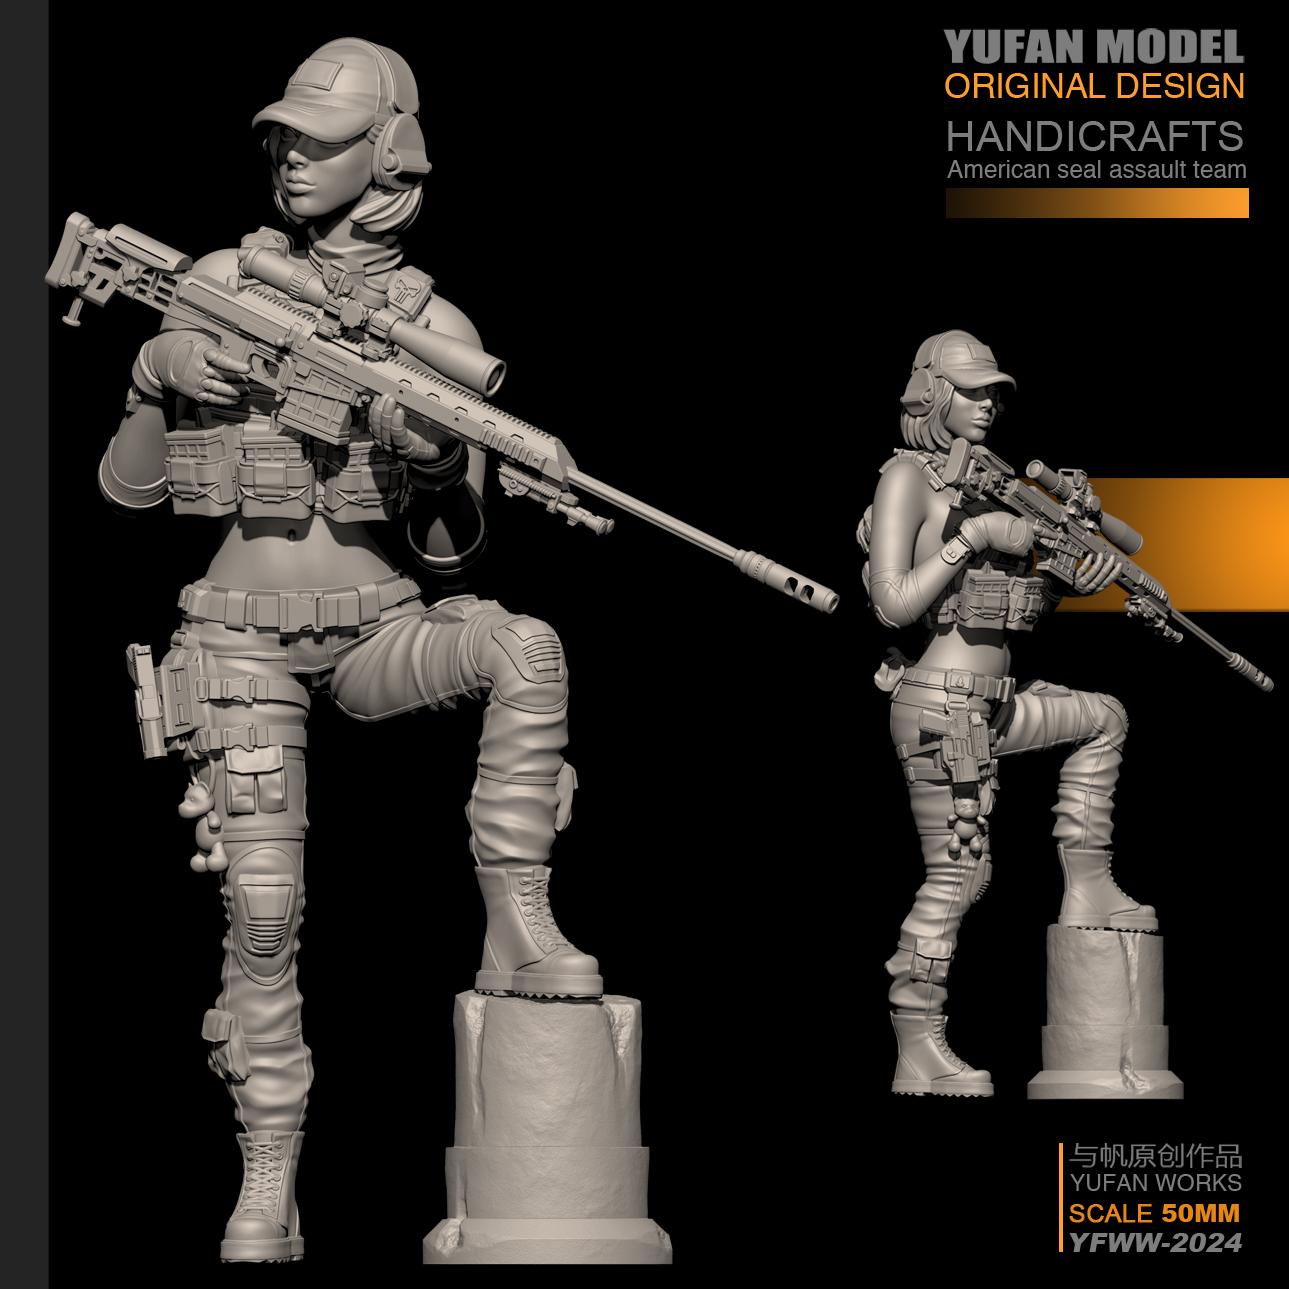 YUFan Model 1/35 Resin Kits Female Sniper Resin Soldier Self-assembled YFWW35-2024